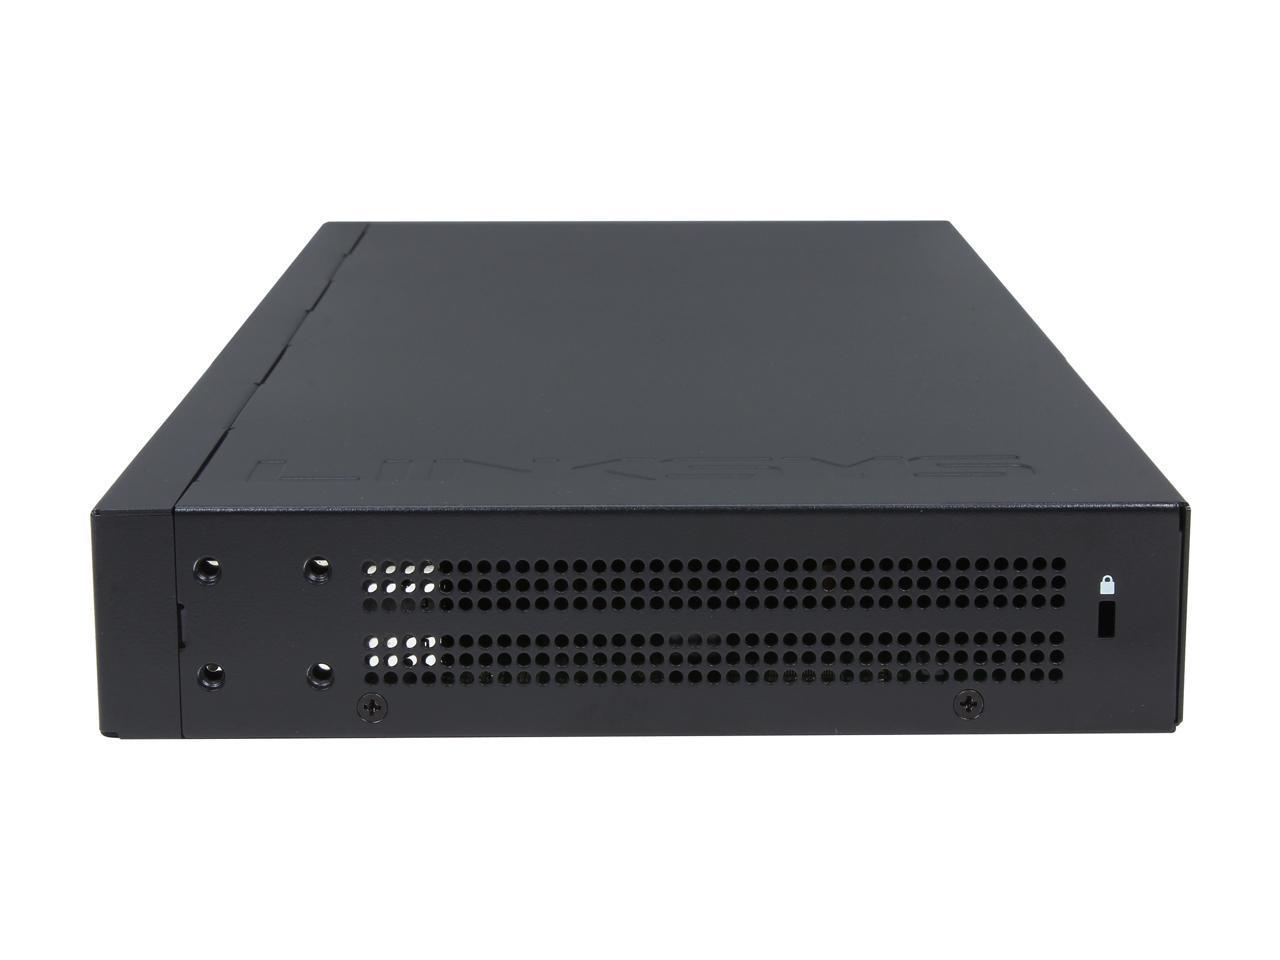 Linksys Lgs326p 26 Port Business Smart Gigabit Poe Switch Newegg Com